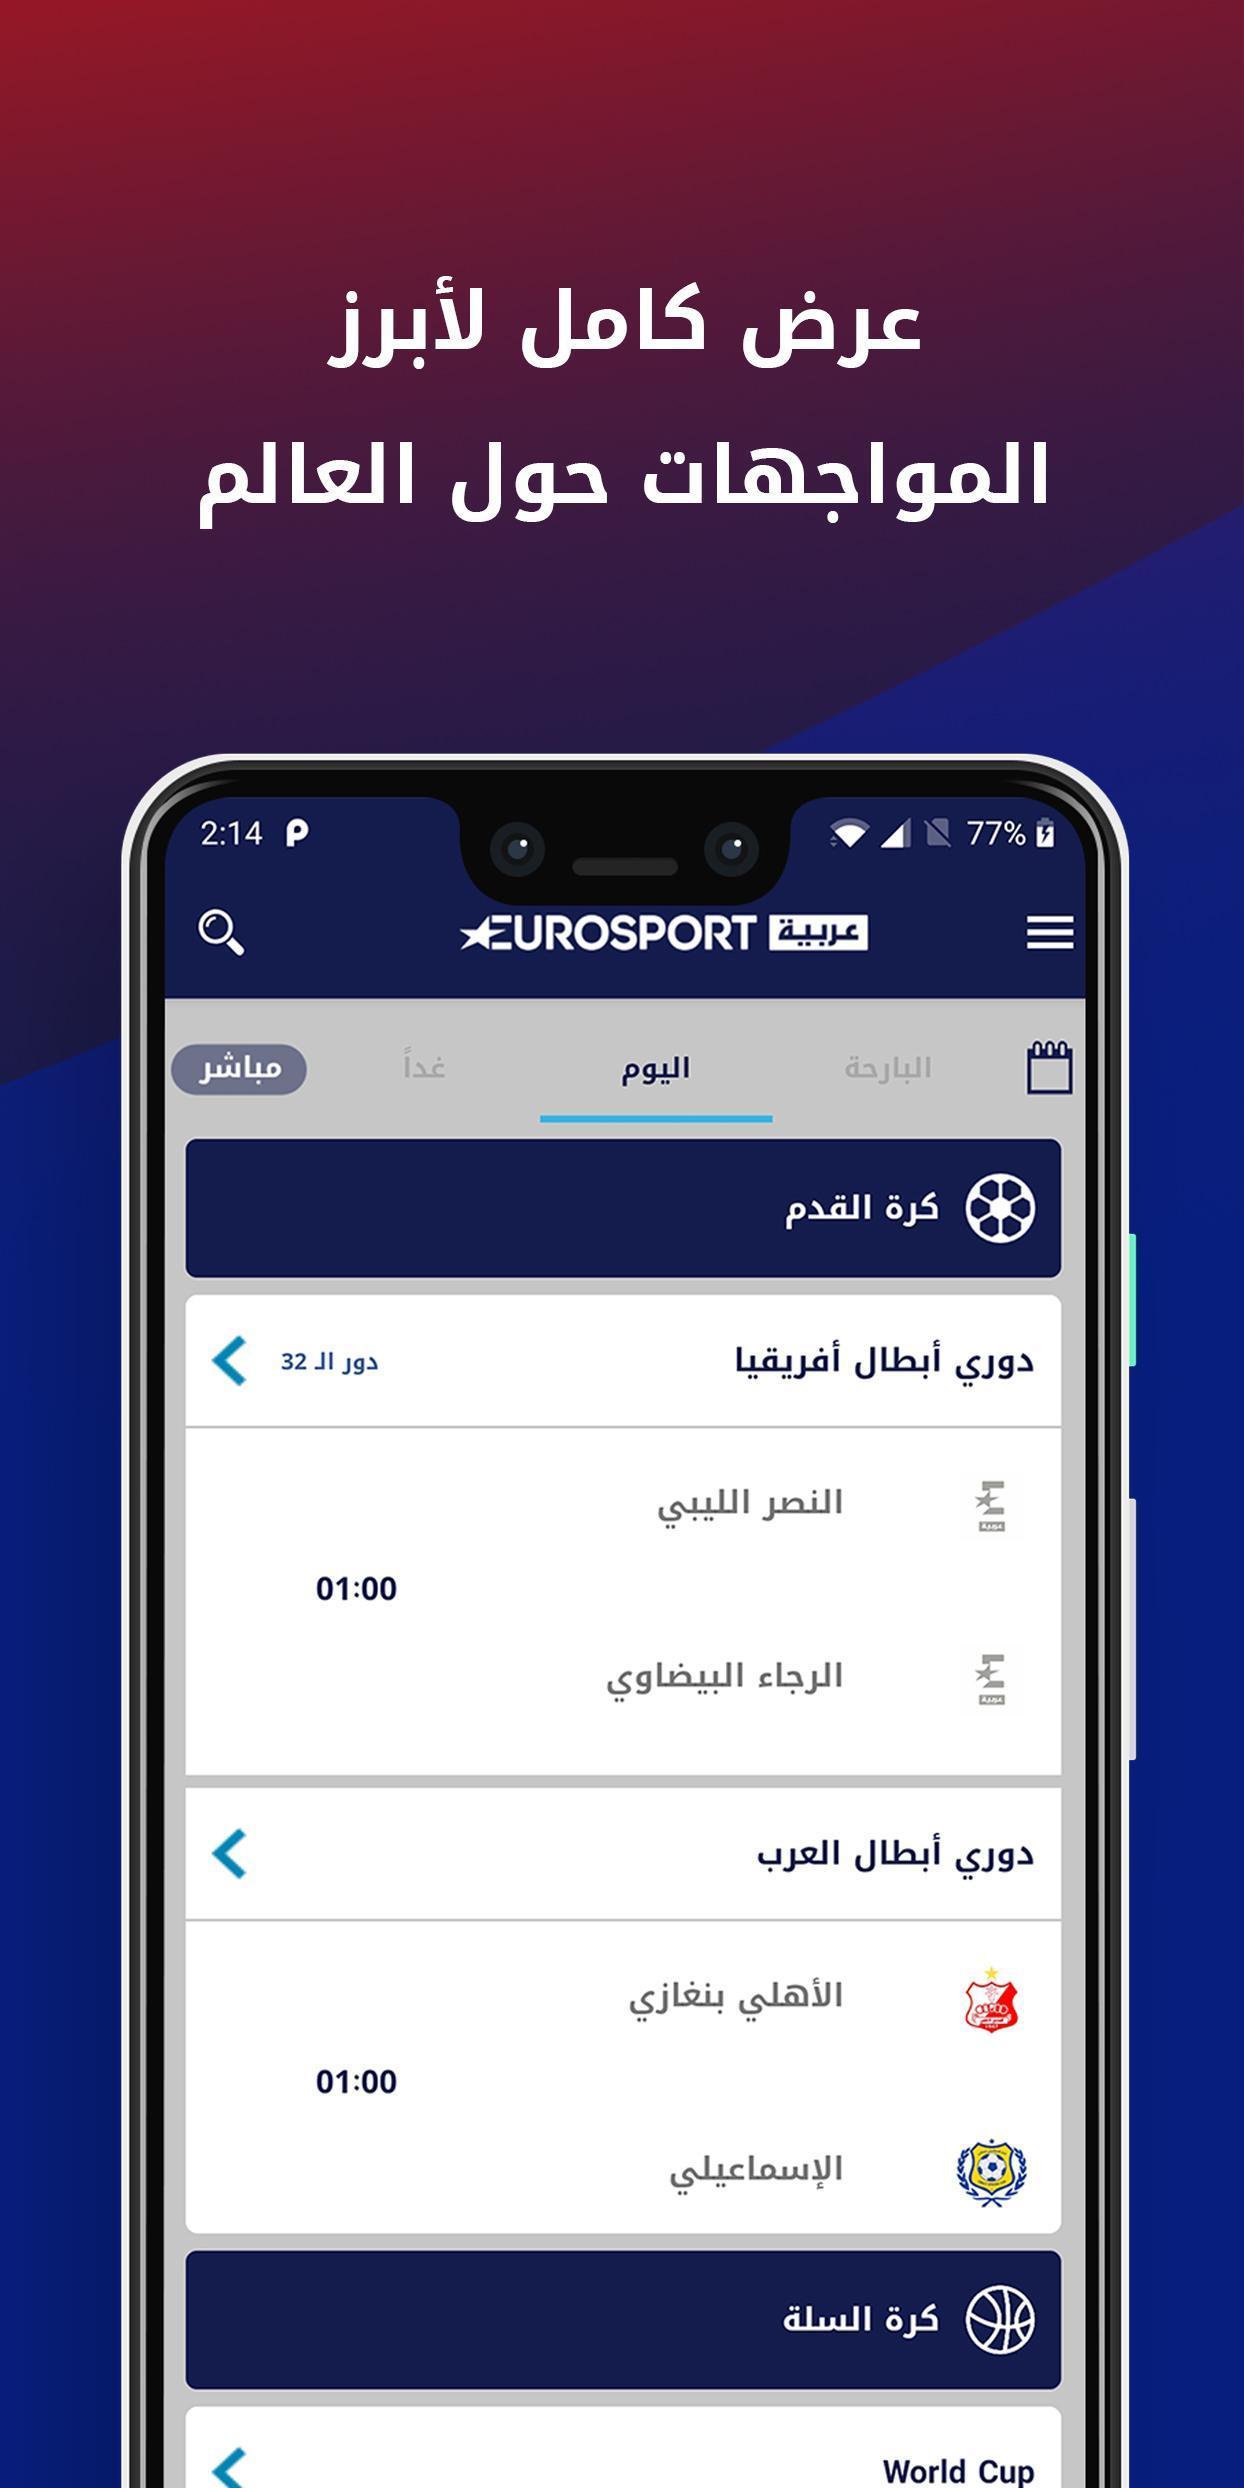 EUROSPORT ARABIA TÉLÉCHARGER